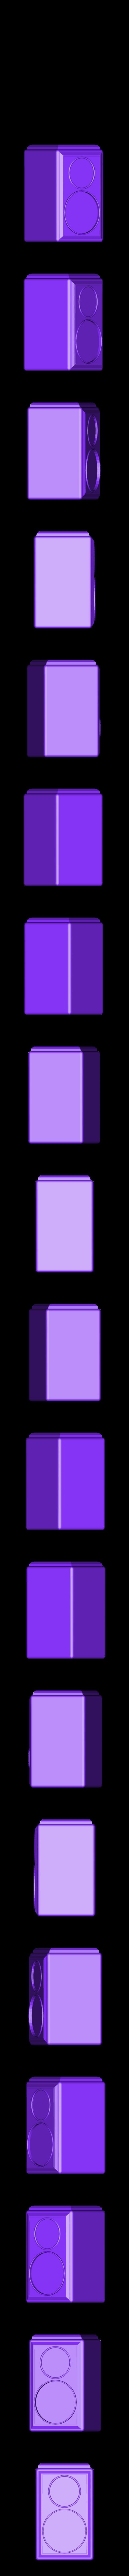 OBJ.obj Download 3DS file RETRO CAMERA FLOWERPOT • 3D printer template, tolgaaxu